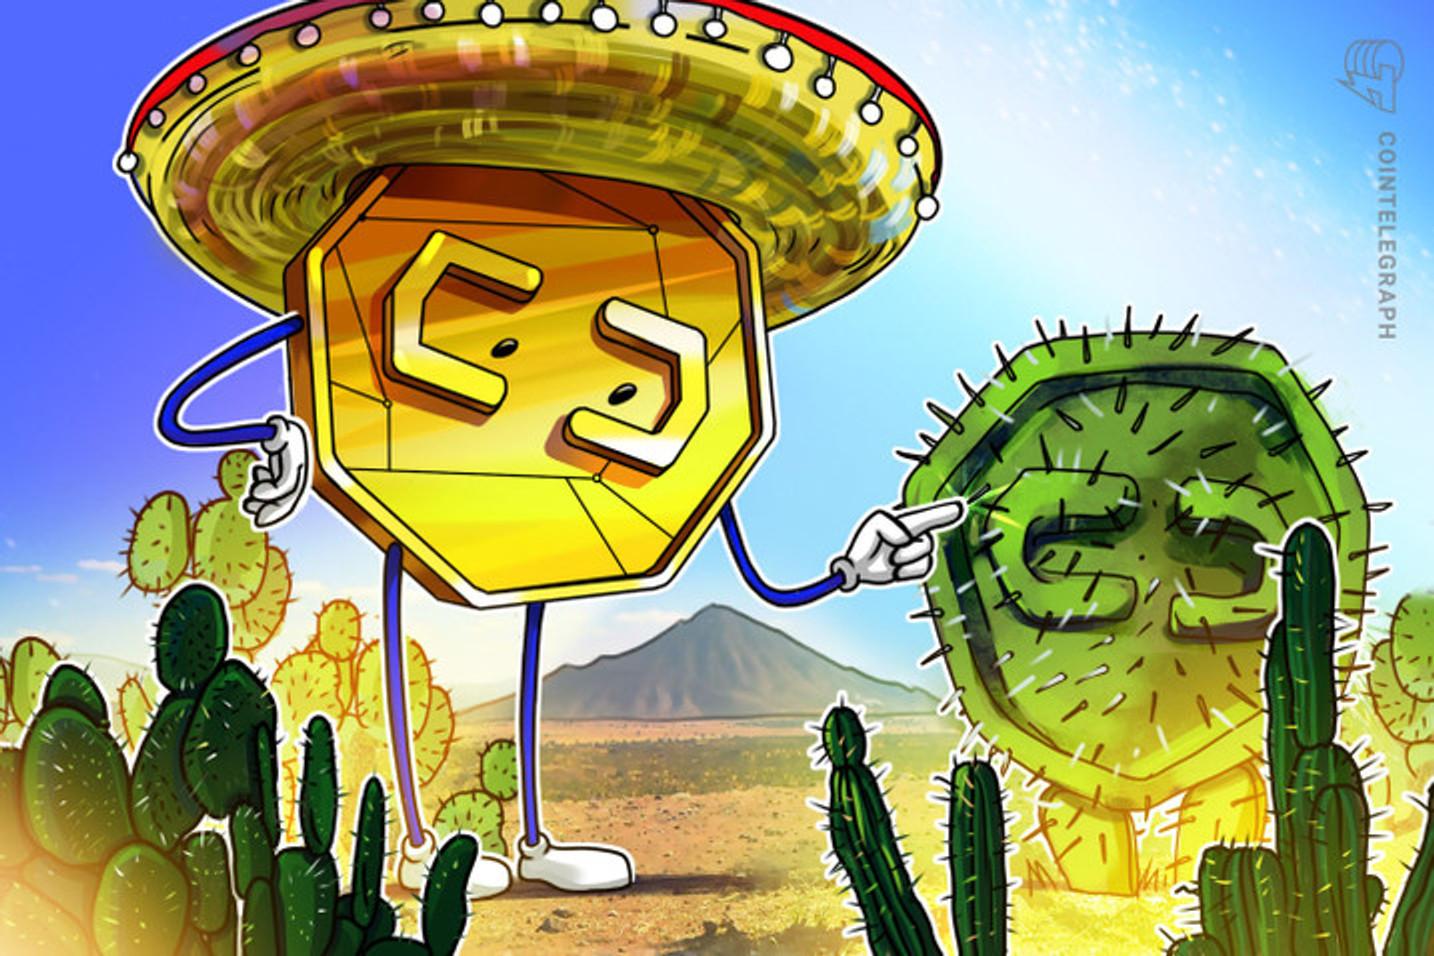 Director de Bitso afirma que ha crecido el volumen de remesas con criptomonedas de Estados Unidos a México